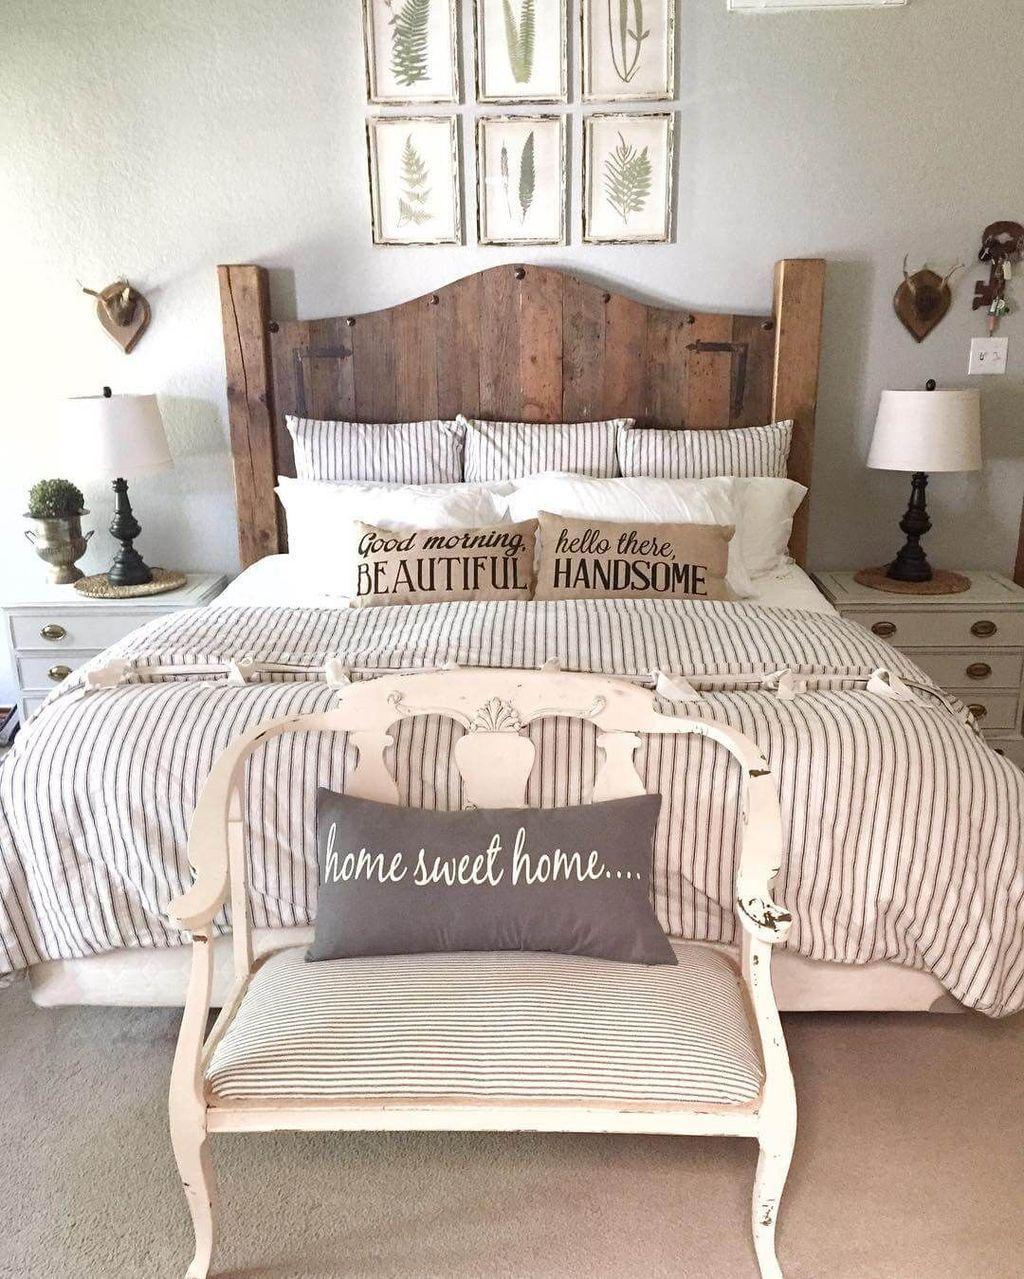 Cozy Farmhouse Master Bedroom Decorating Ideas 33 Farmhouse Bedroom Decor Remodel Bedroom Rustic Farmhouse Bedroom